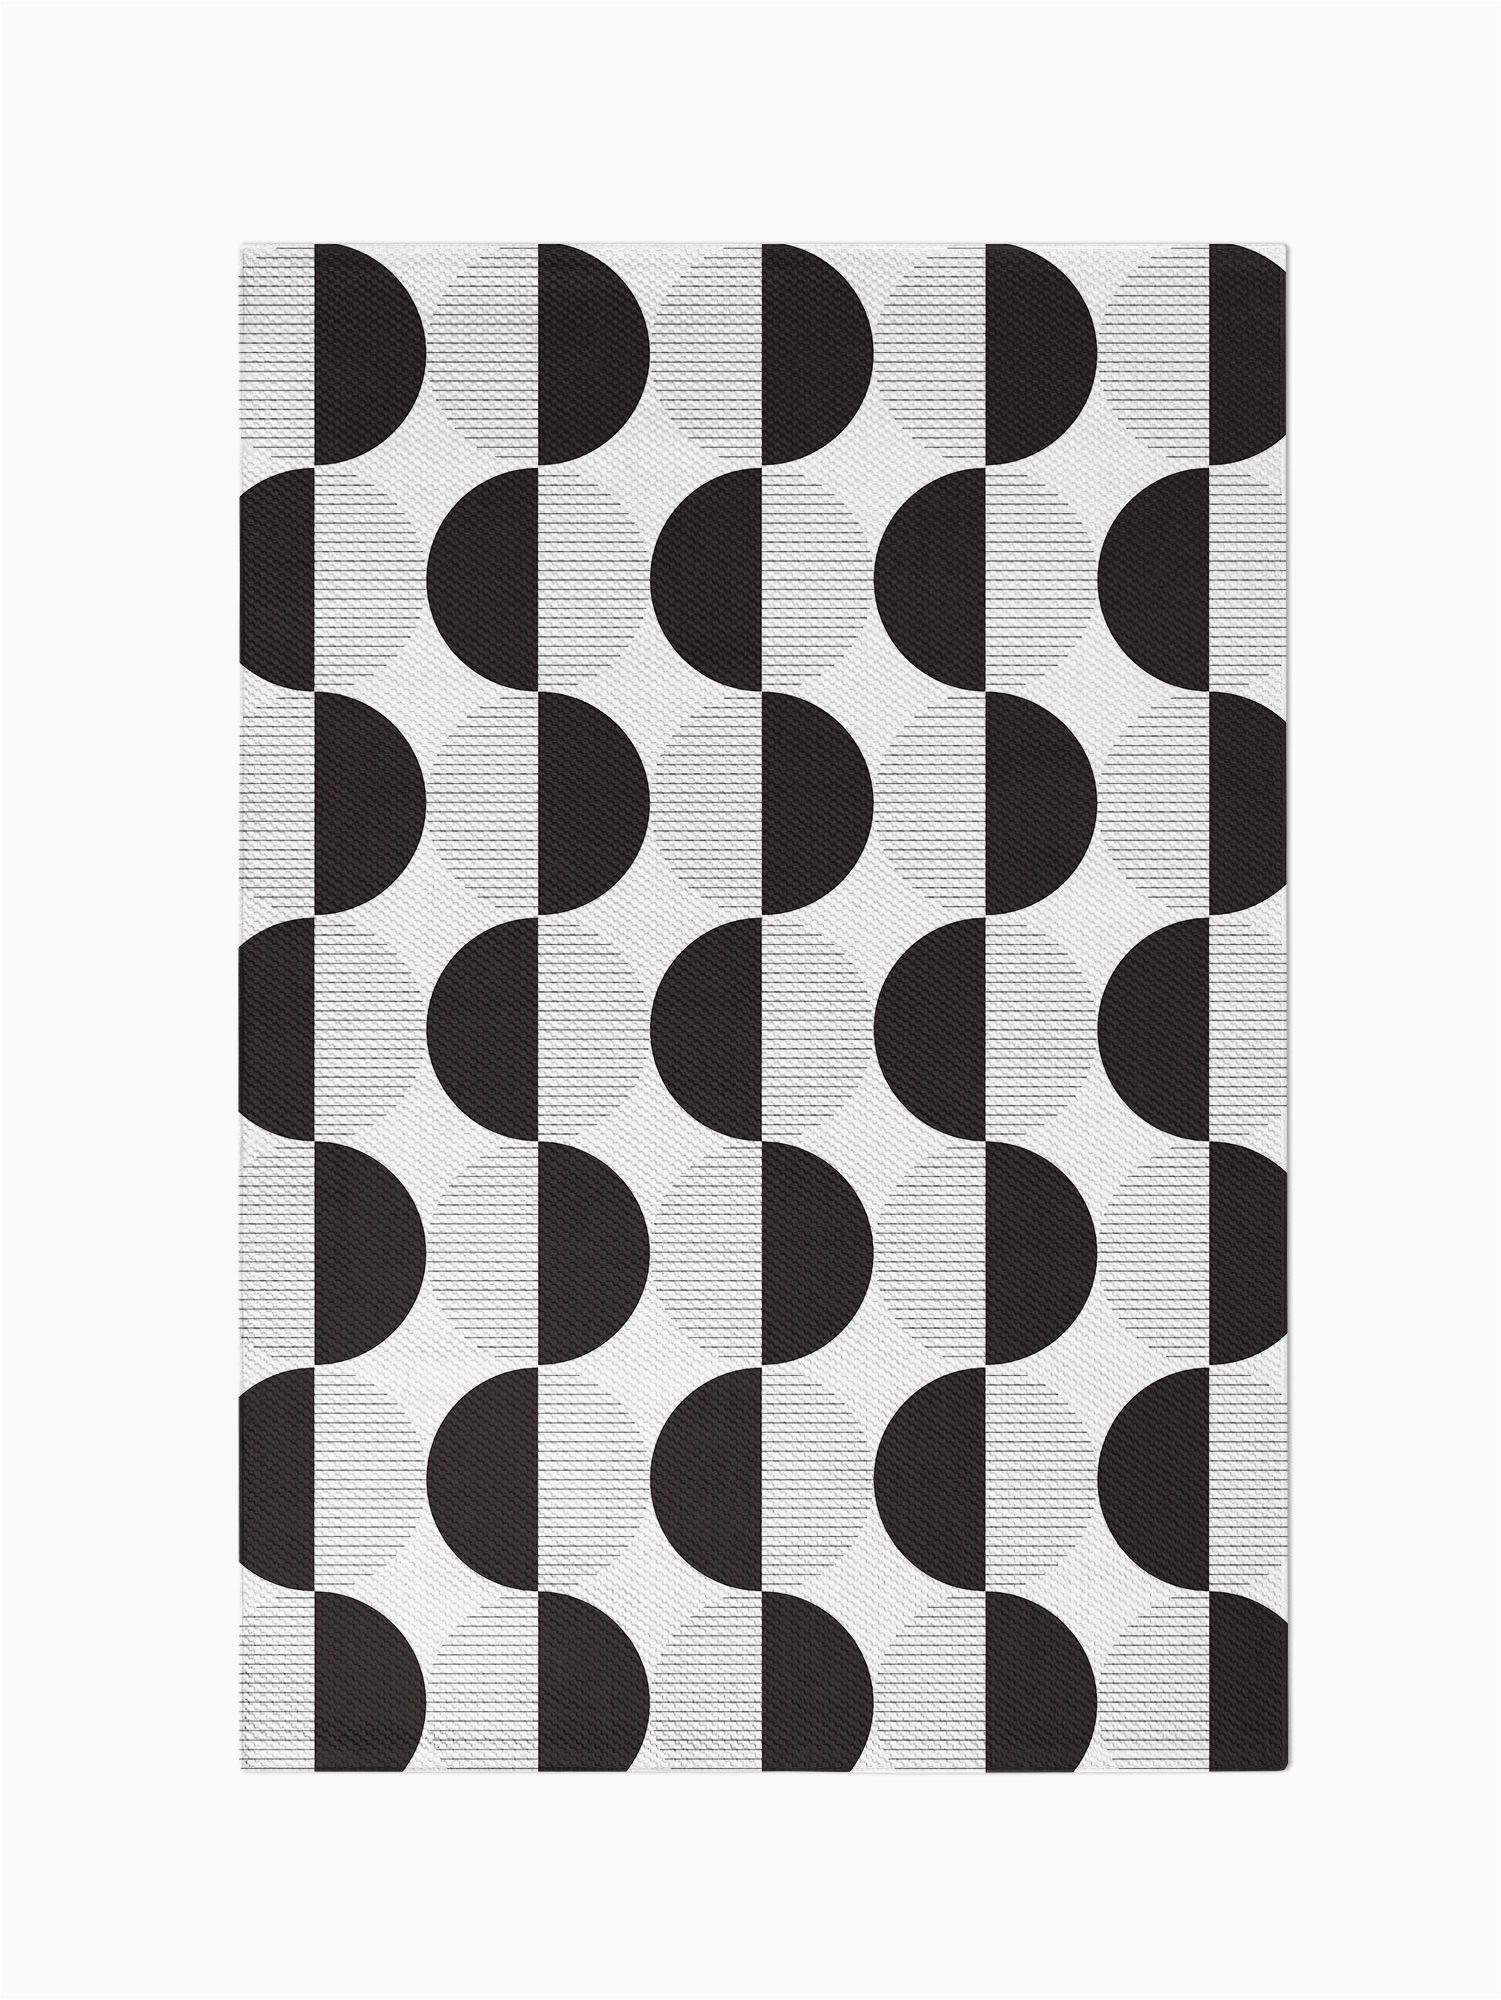 Black and White area Rugs 3×5 Black White Geometric Circles area Rug